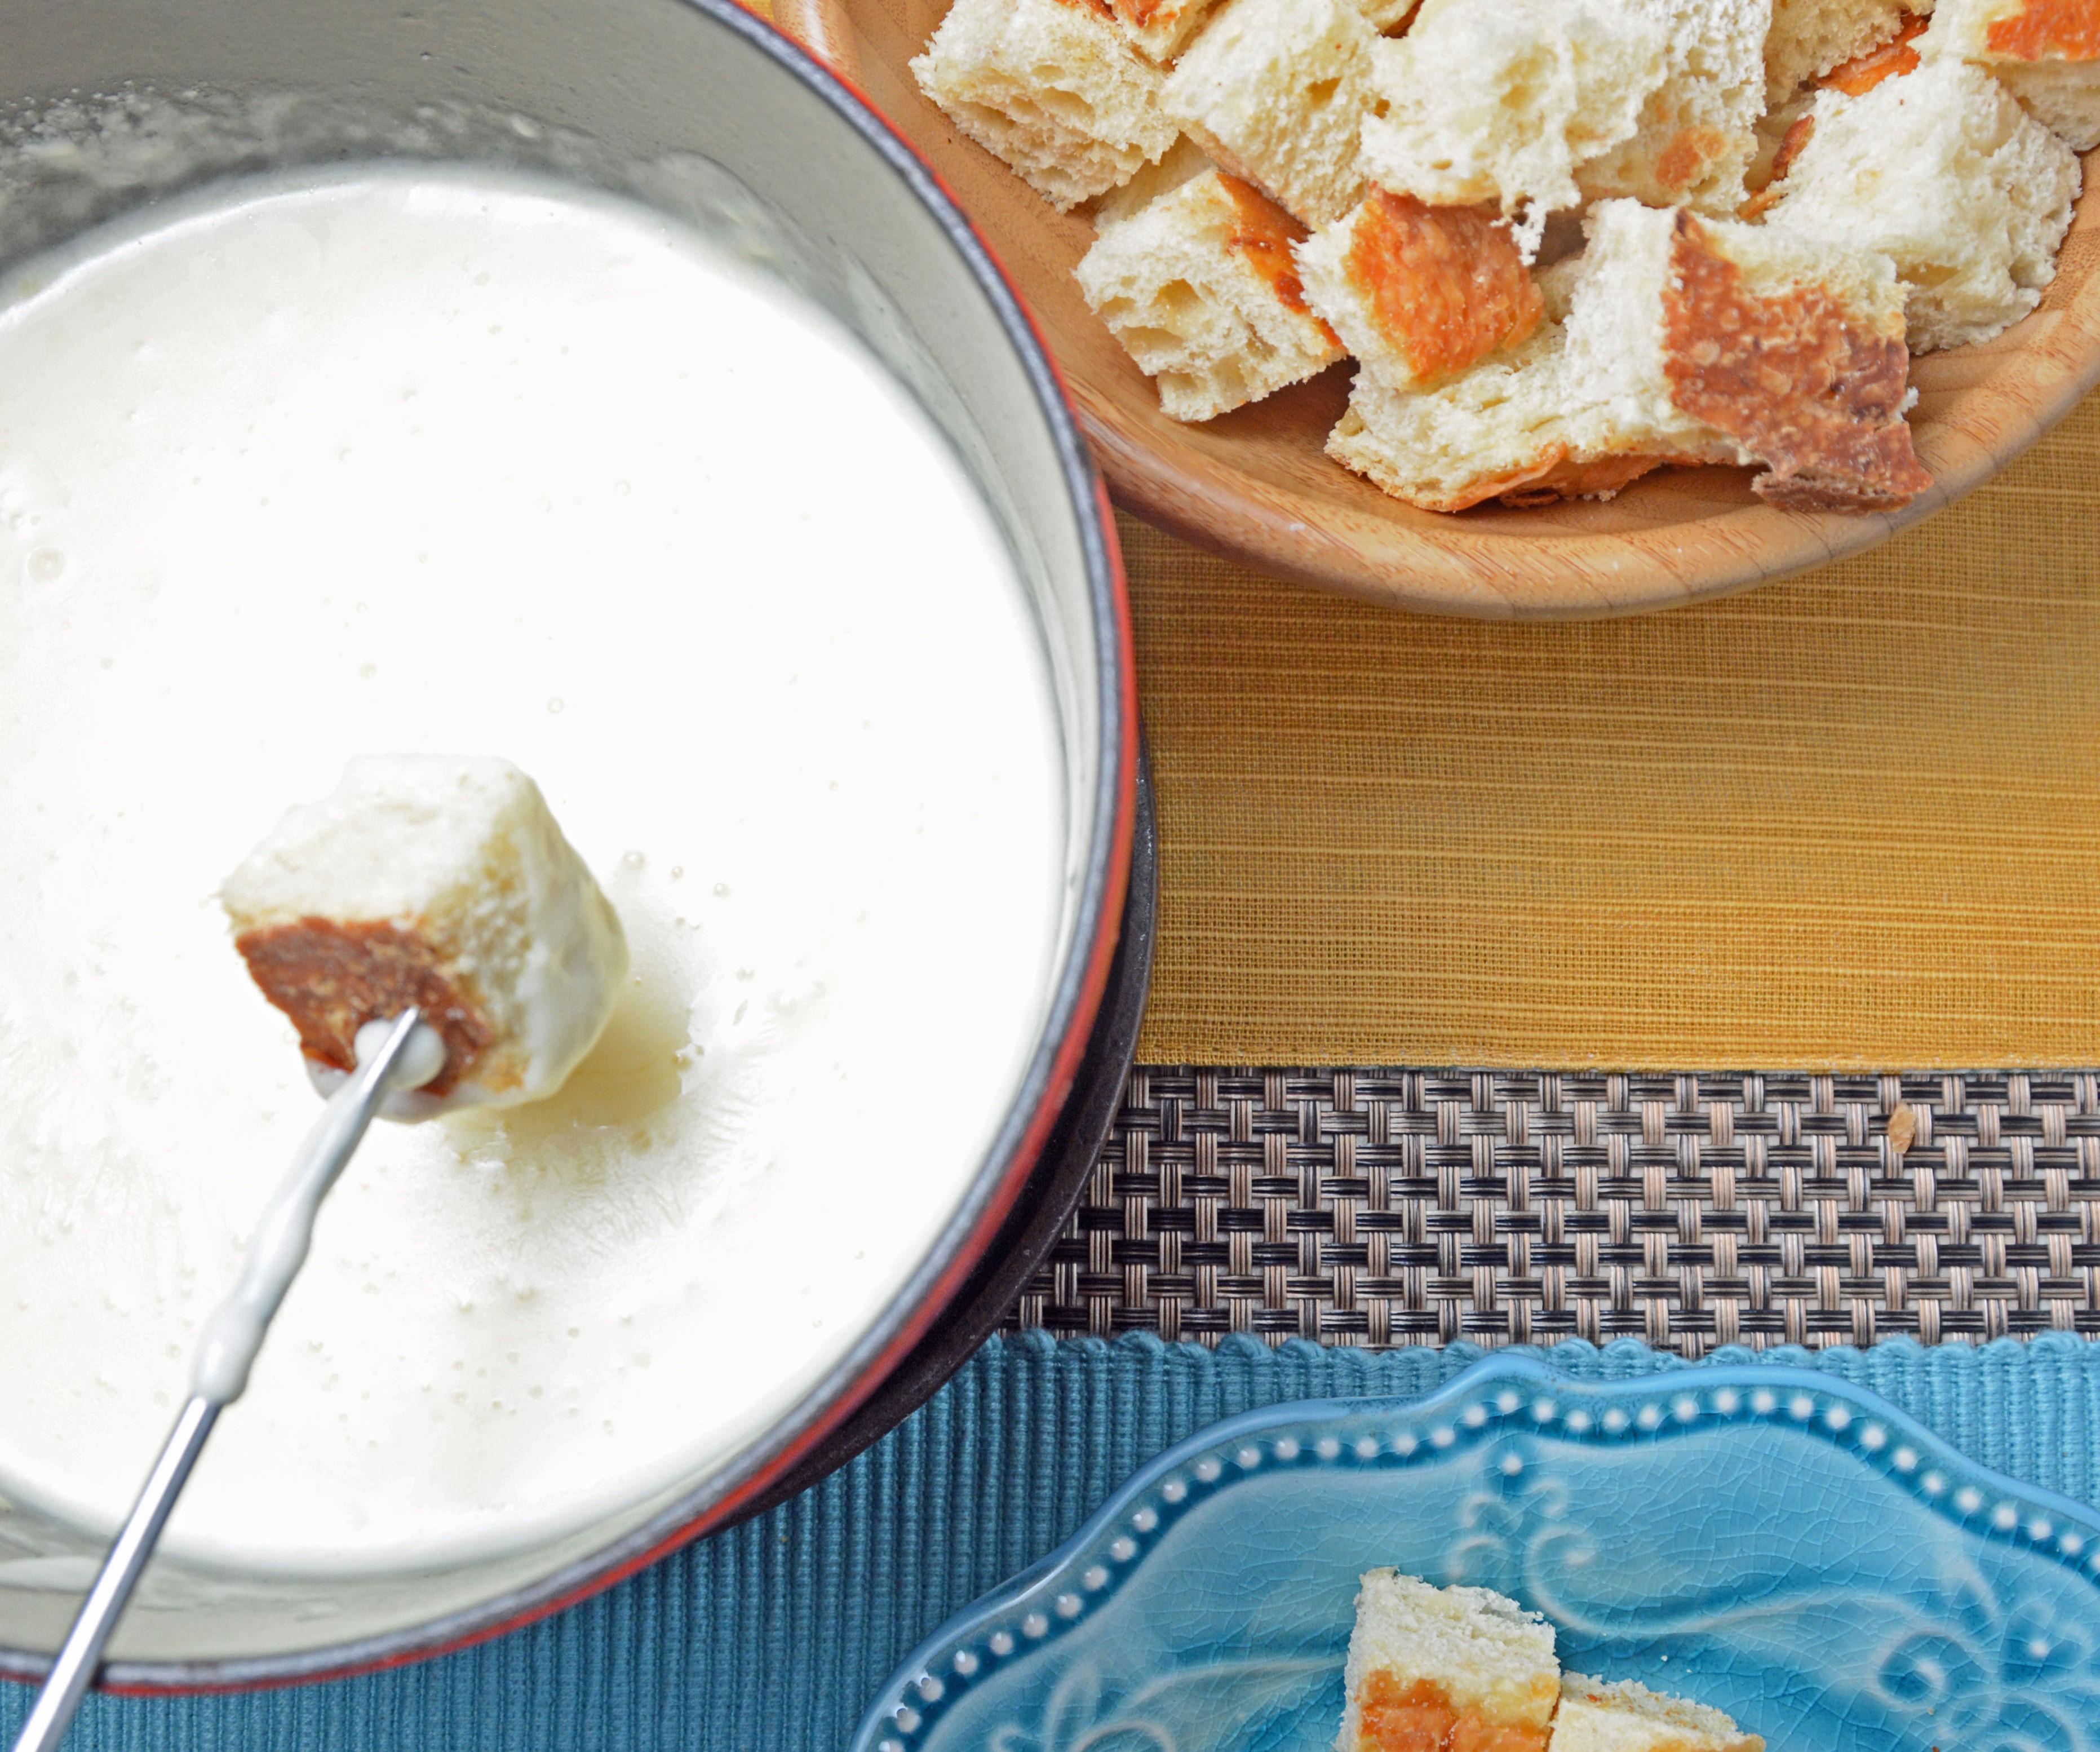 Easy Way to Make Cheese Fondue